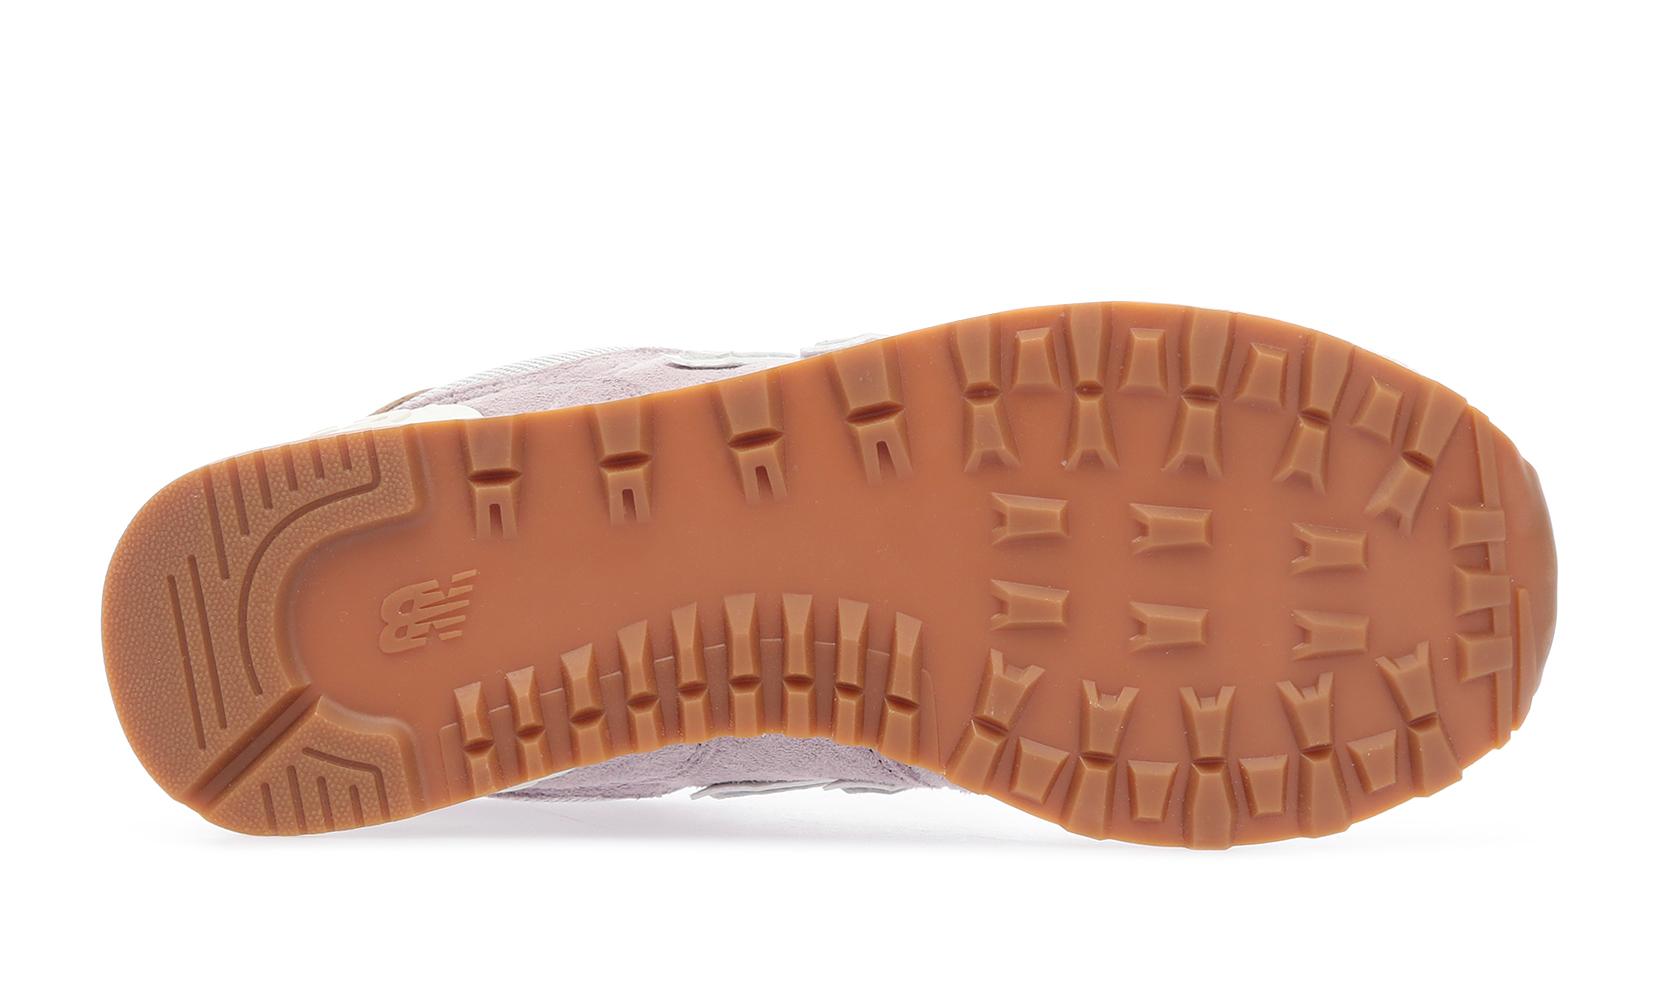 Жіноче взуття повсякденне New Balance 574 WL574CLC | New Balance